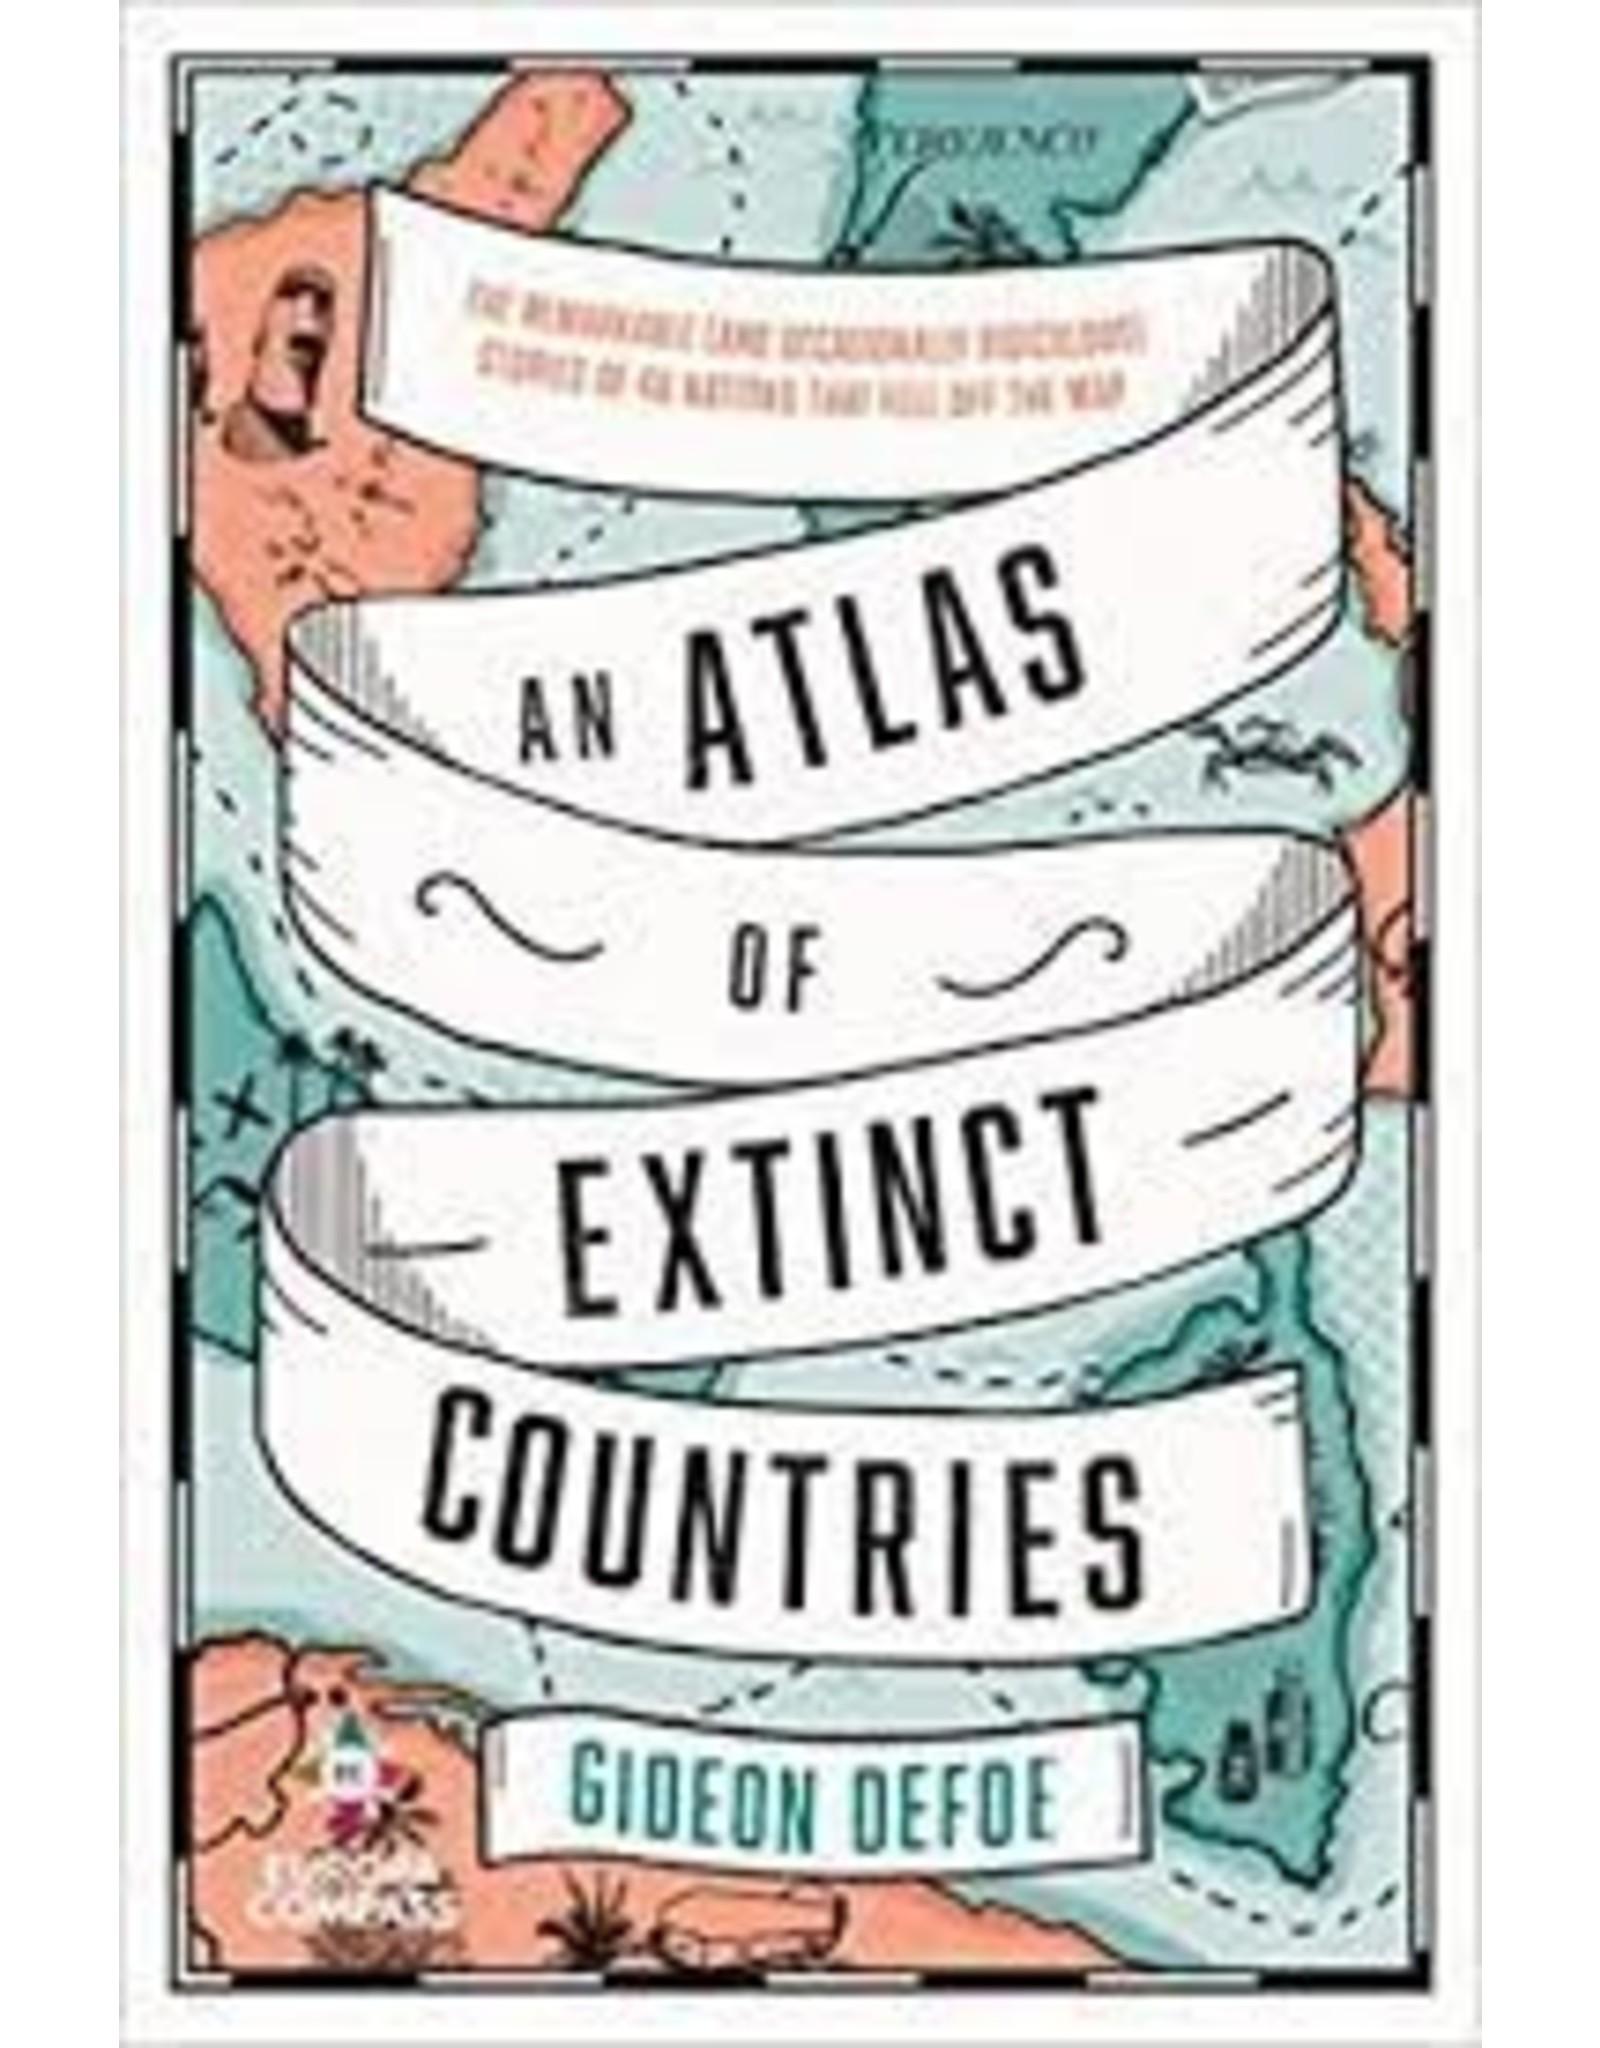 Books An Atlas of Extinct Countries by Gideon Defoe